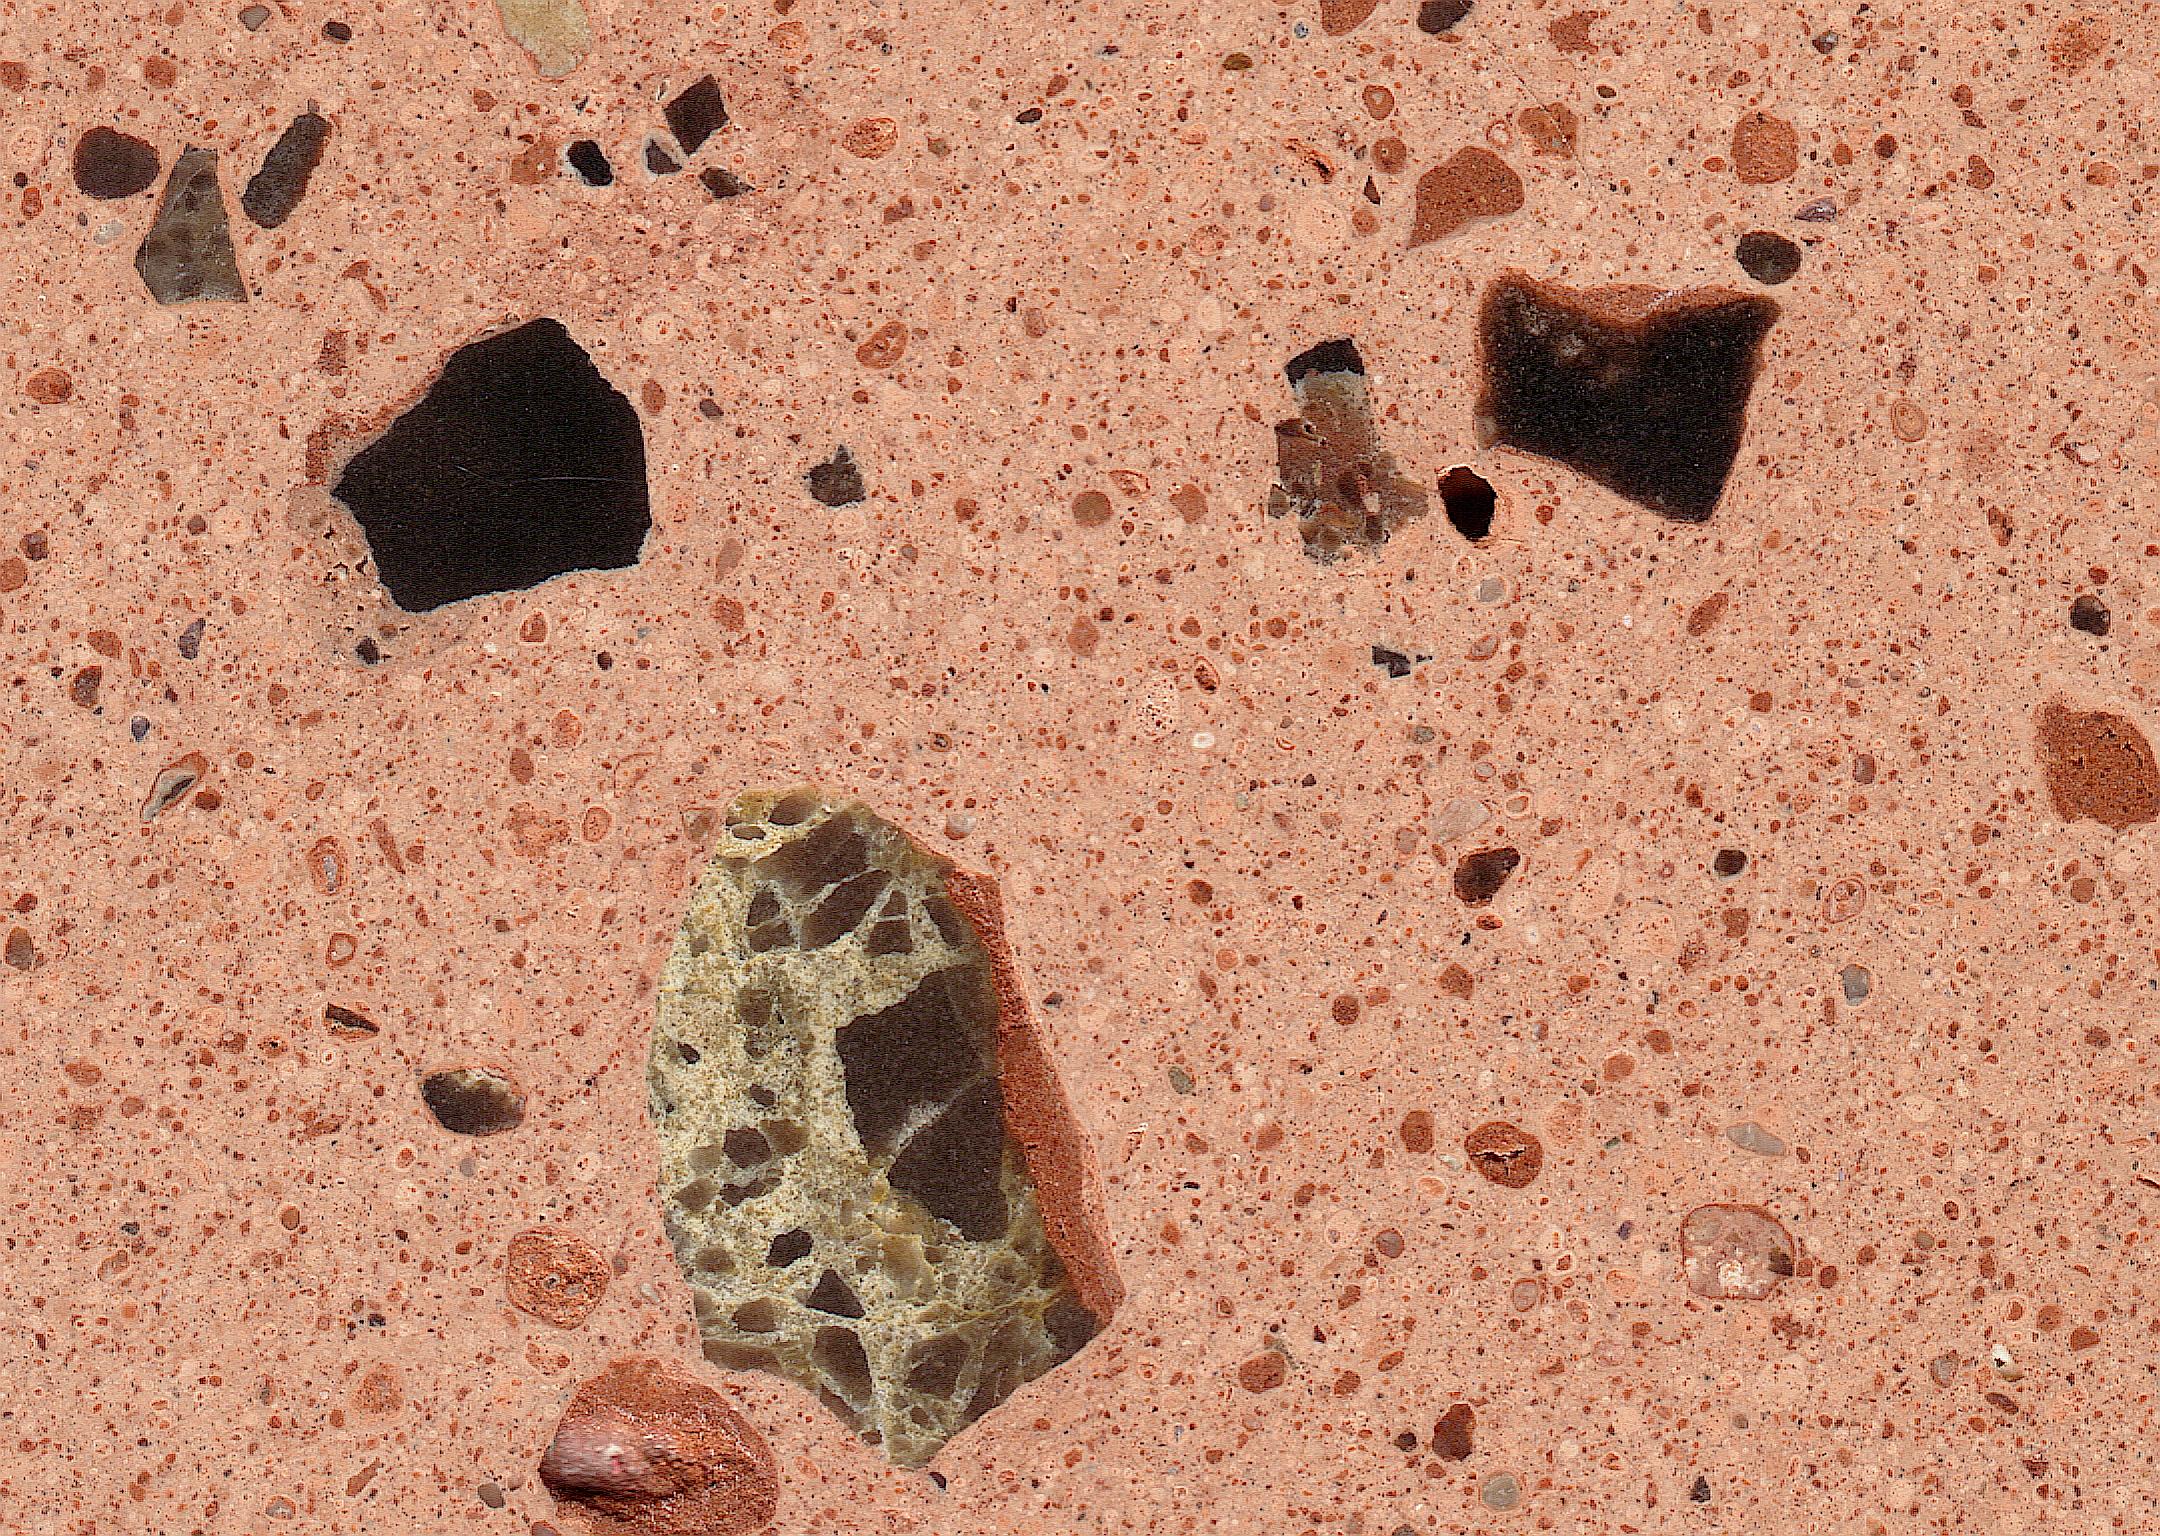 Rubielos de la Cérida impact basin - lapillistone breccia